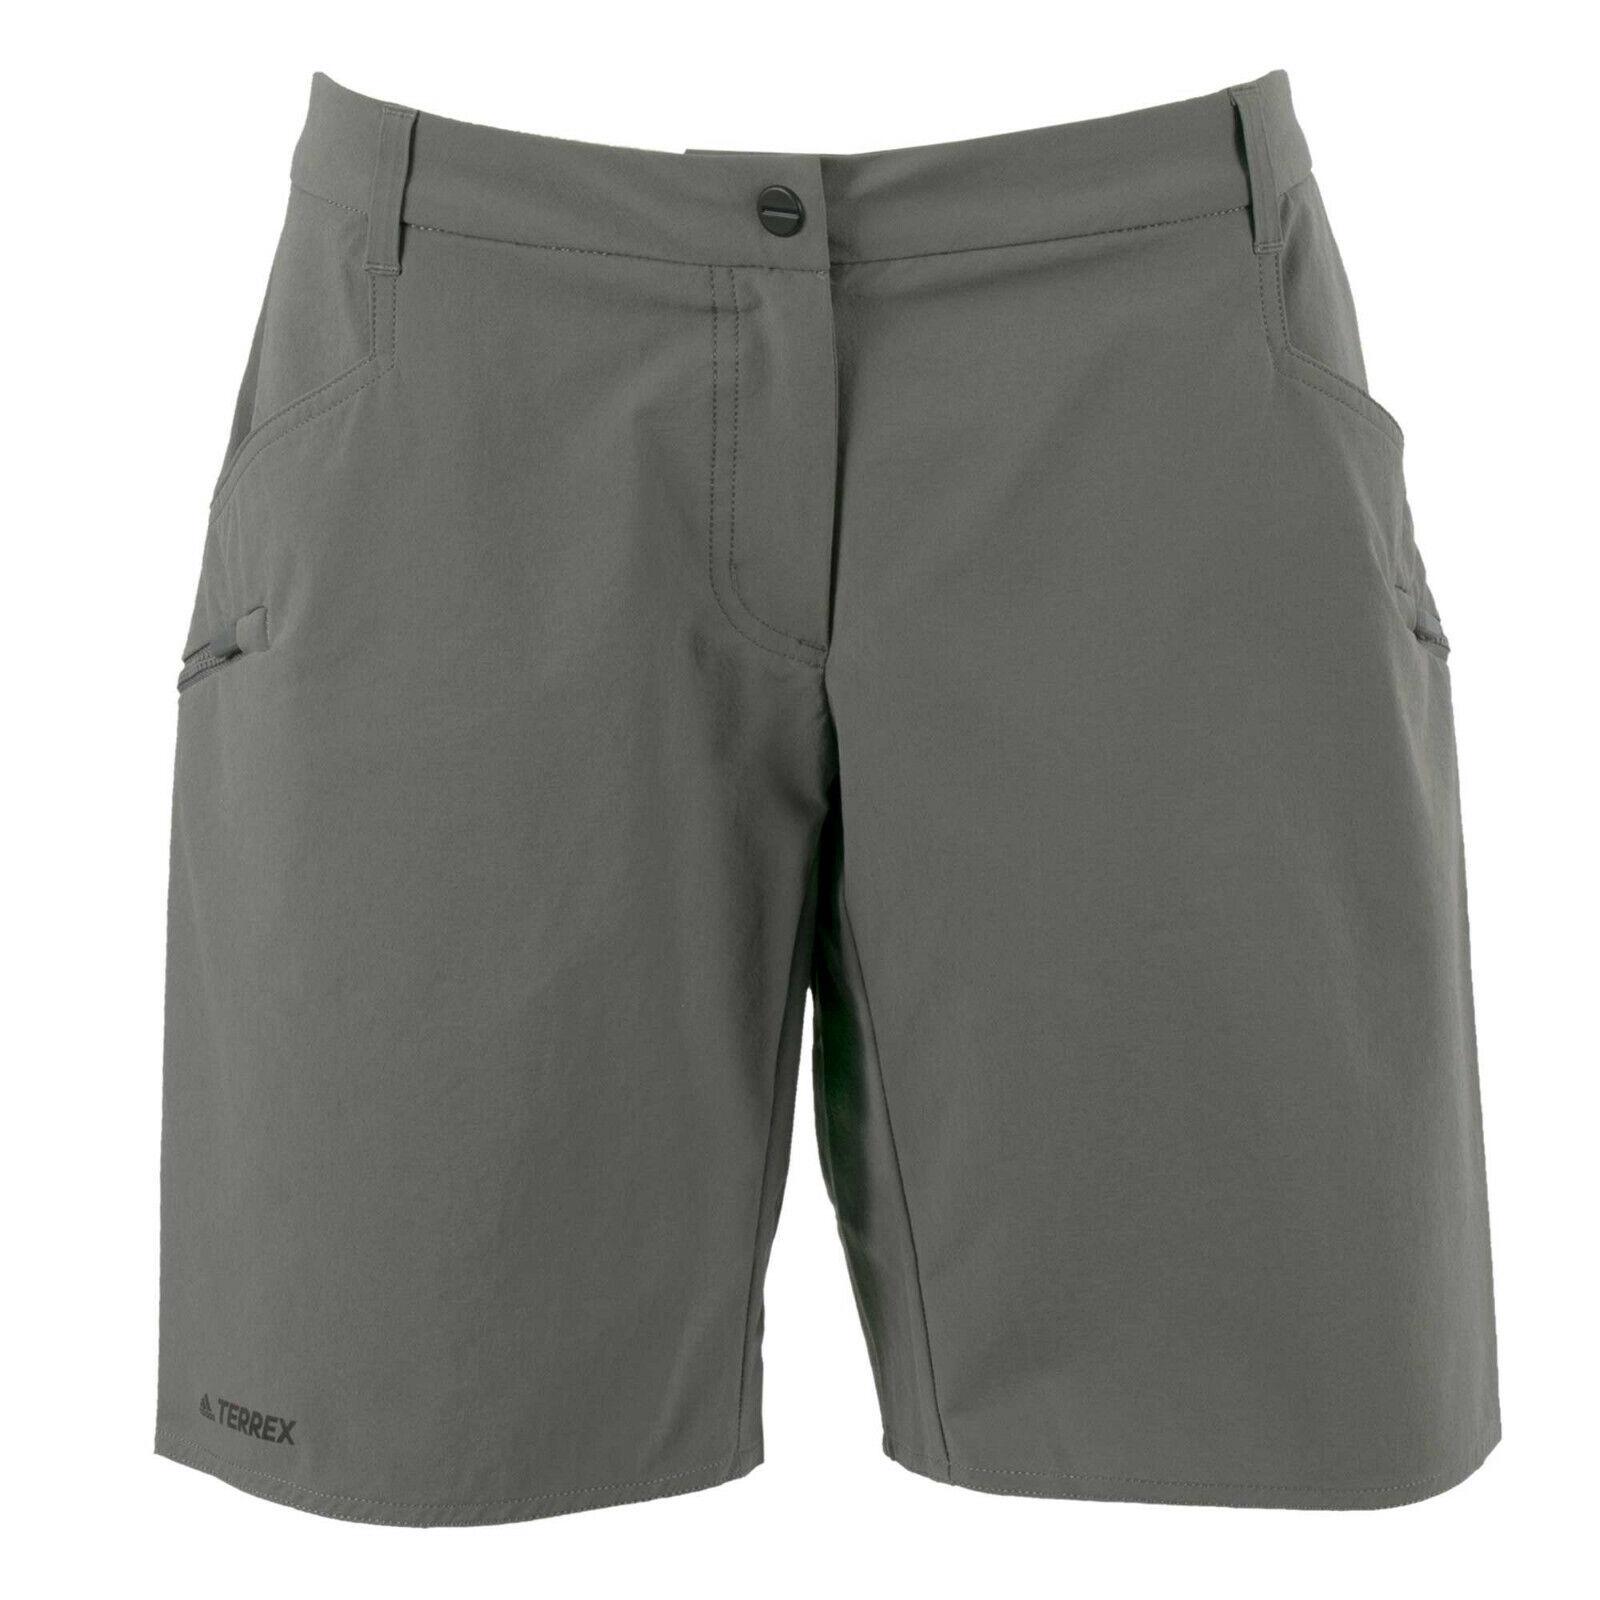 adidas Damen Shorts FN1496 Trailcross Short Grau / 40 / kurze Hose, Wanderhose